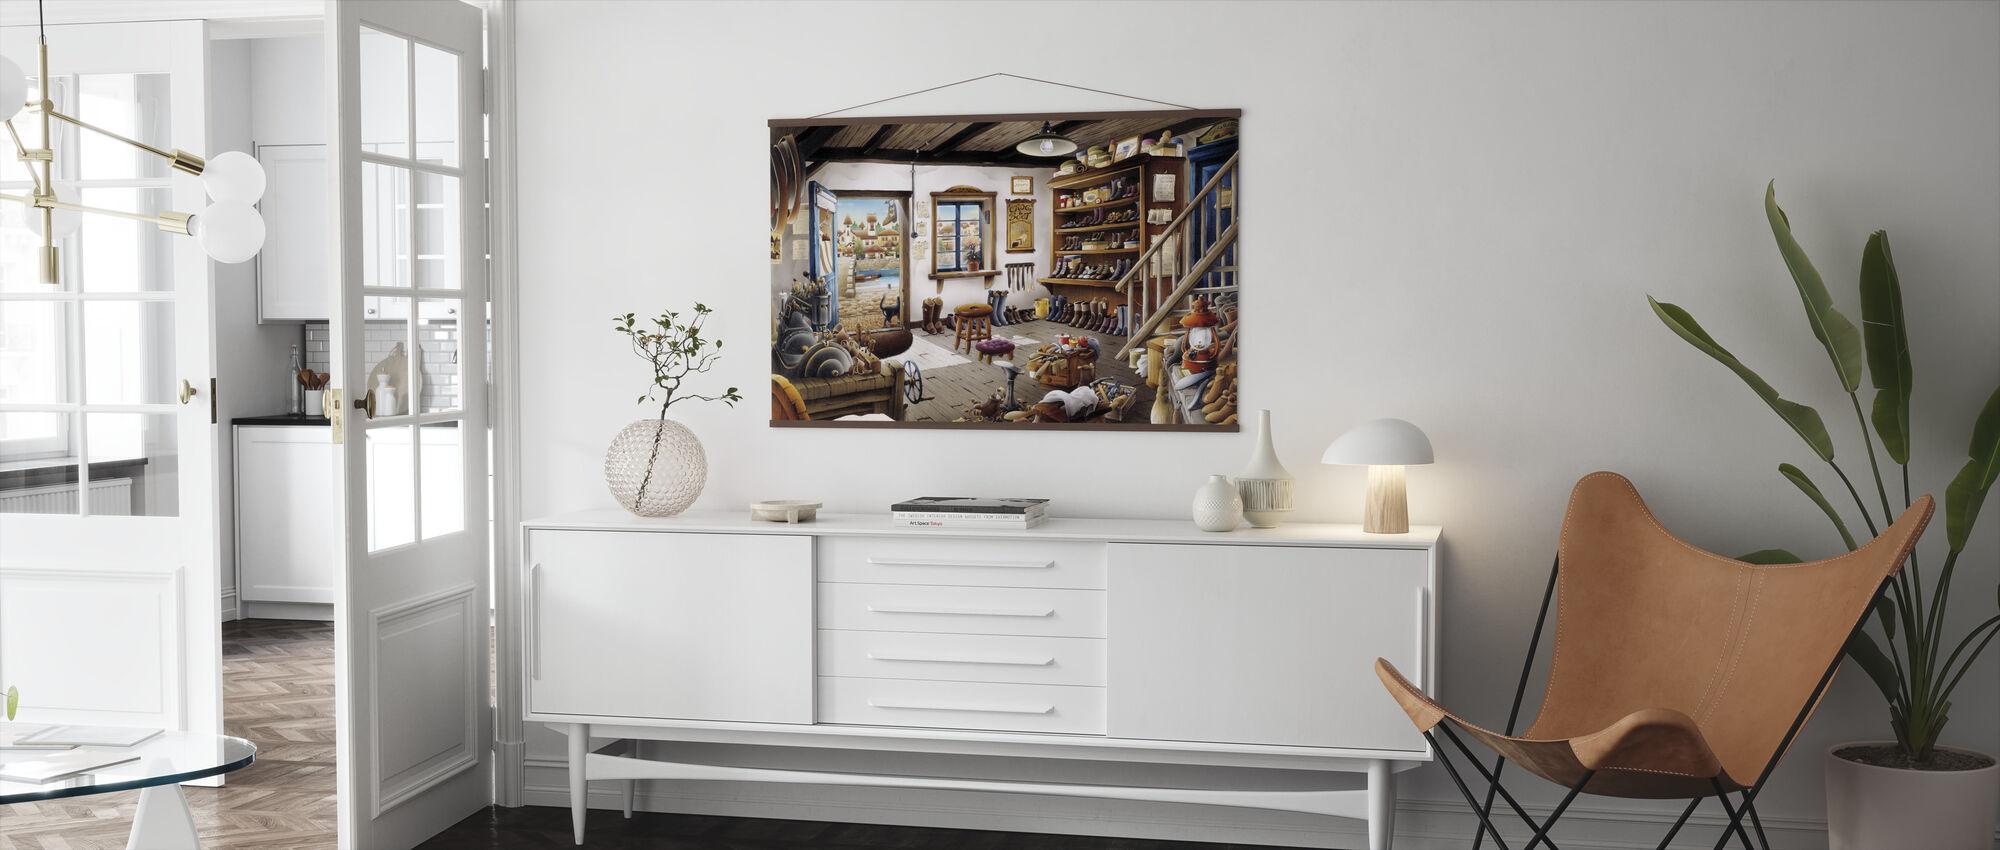 The Cobbler Shop - Poster - Living Room